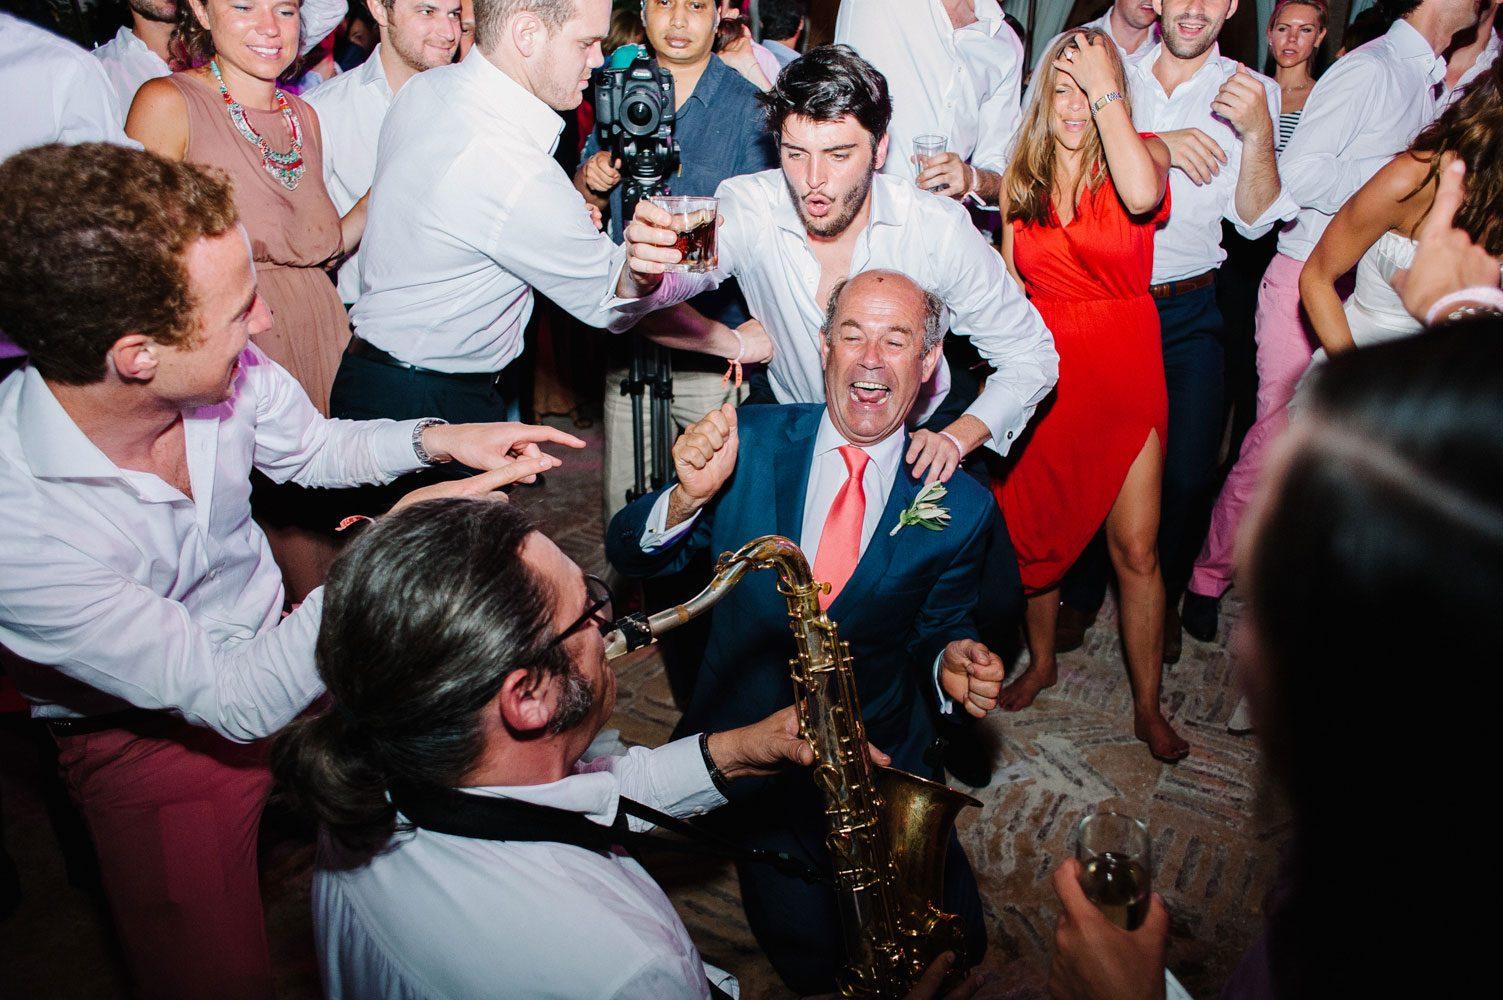 saxophonist playing at beldi wedding